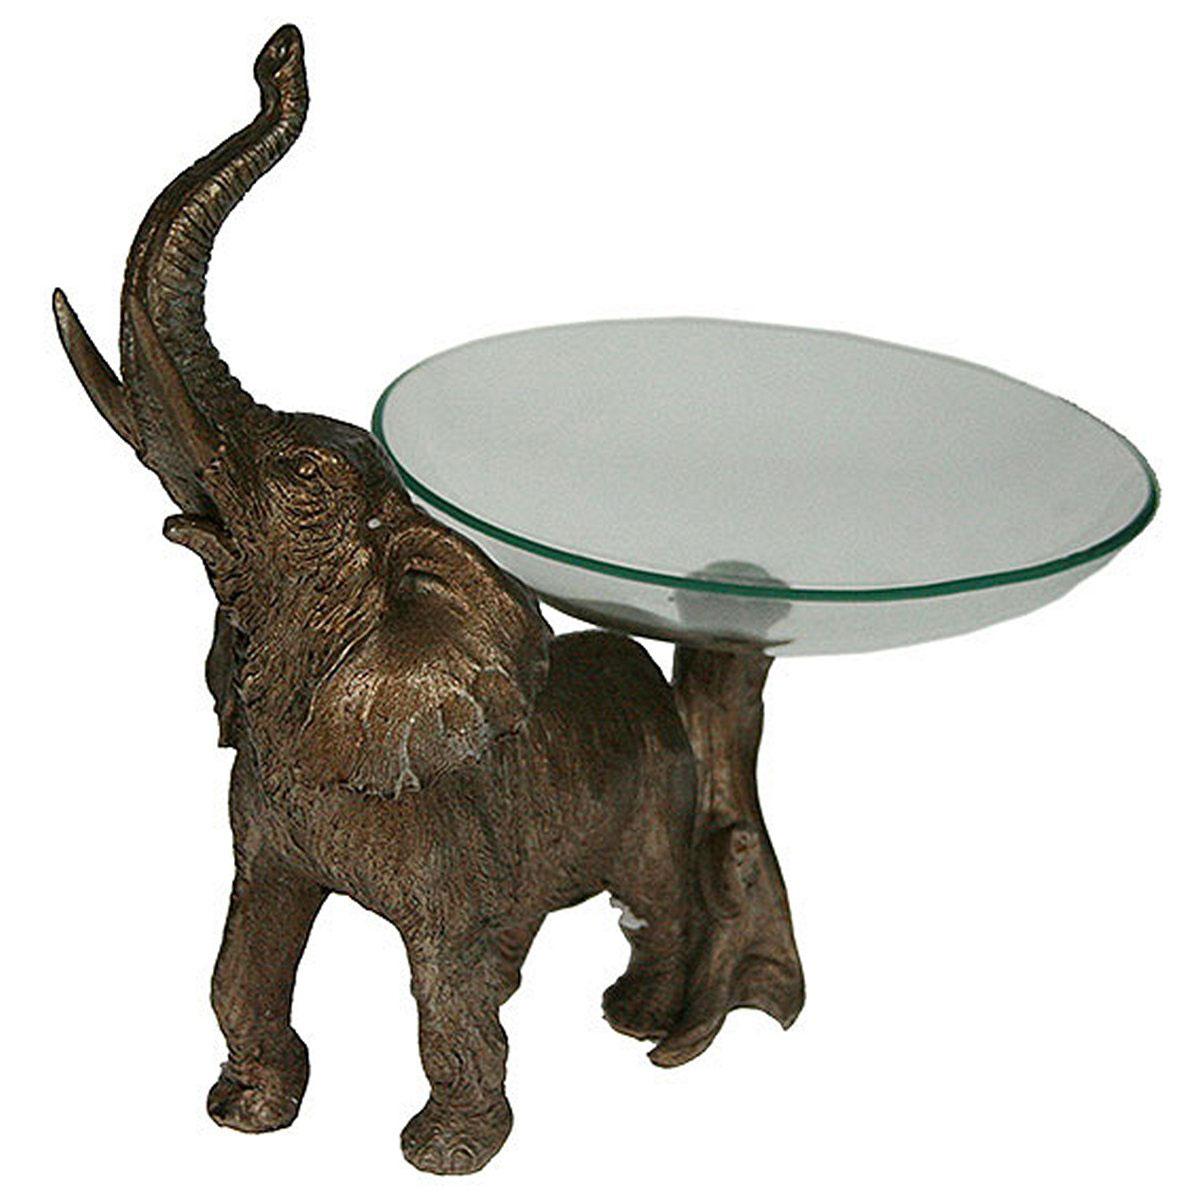 Фруктовница Русские Подарки Слоны, 35 х 26 х 33 см. 5160151601